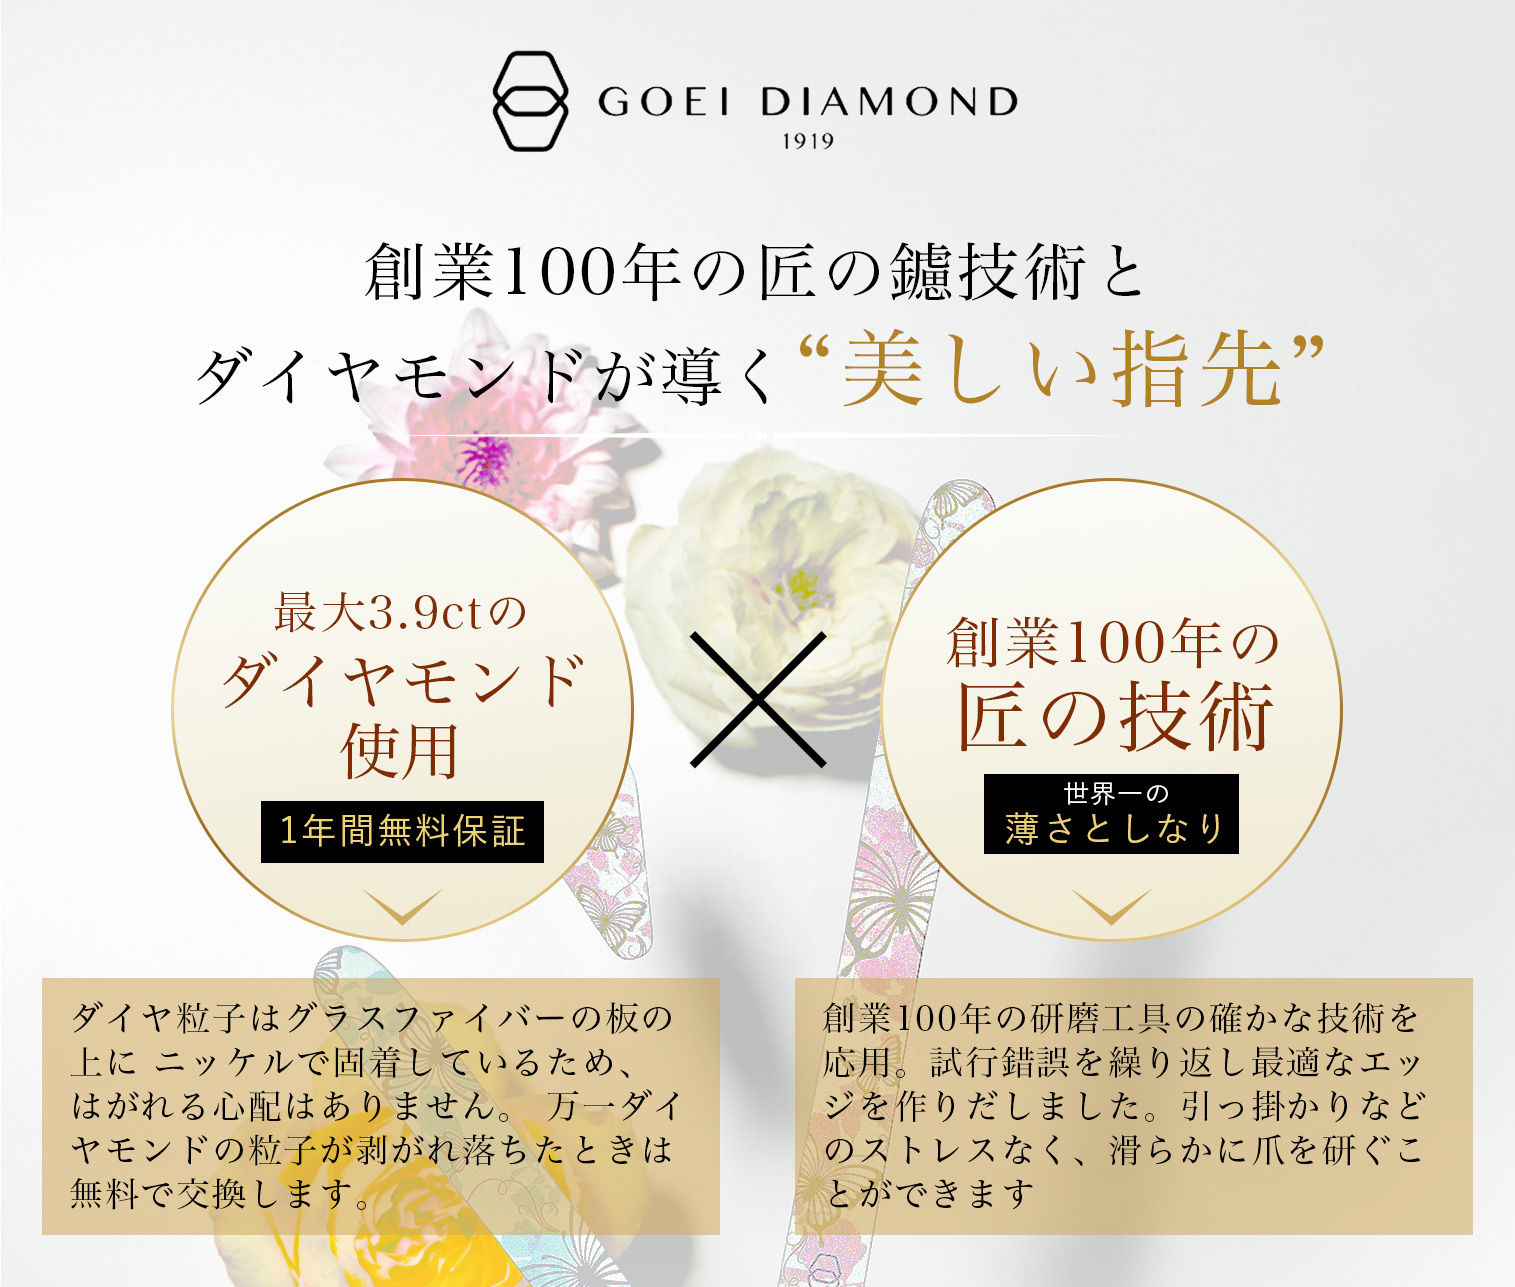 "GOEIDIAMON1919創業100年の匠の鑢技術とダイヤモンドが導く""美しい指先""最大3.9ctのダイヤモンド使用1年間無料保証創業100年の匠の技術世界一の薄さとしなりダイヤ粒子はグラスファイバーの板の上に ニッケルで固着しているため、 はがれる心配はありません。 万一ダイヤモンドの粒子が剥がれ落ちたときは 無料で交換します。創業100年の研磨工具の確かな技術を応用。試行錯誤を繰り返し最適なエッジを作りだしました。引っ掛かりなどのストレスなく、滑らかに爪を研ぐことができます"